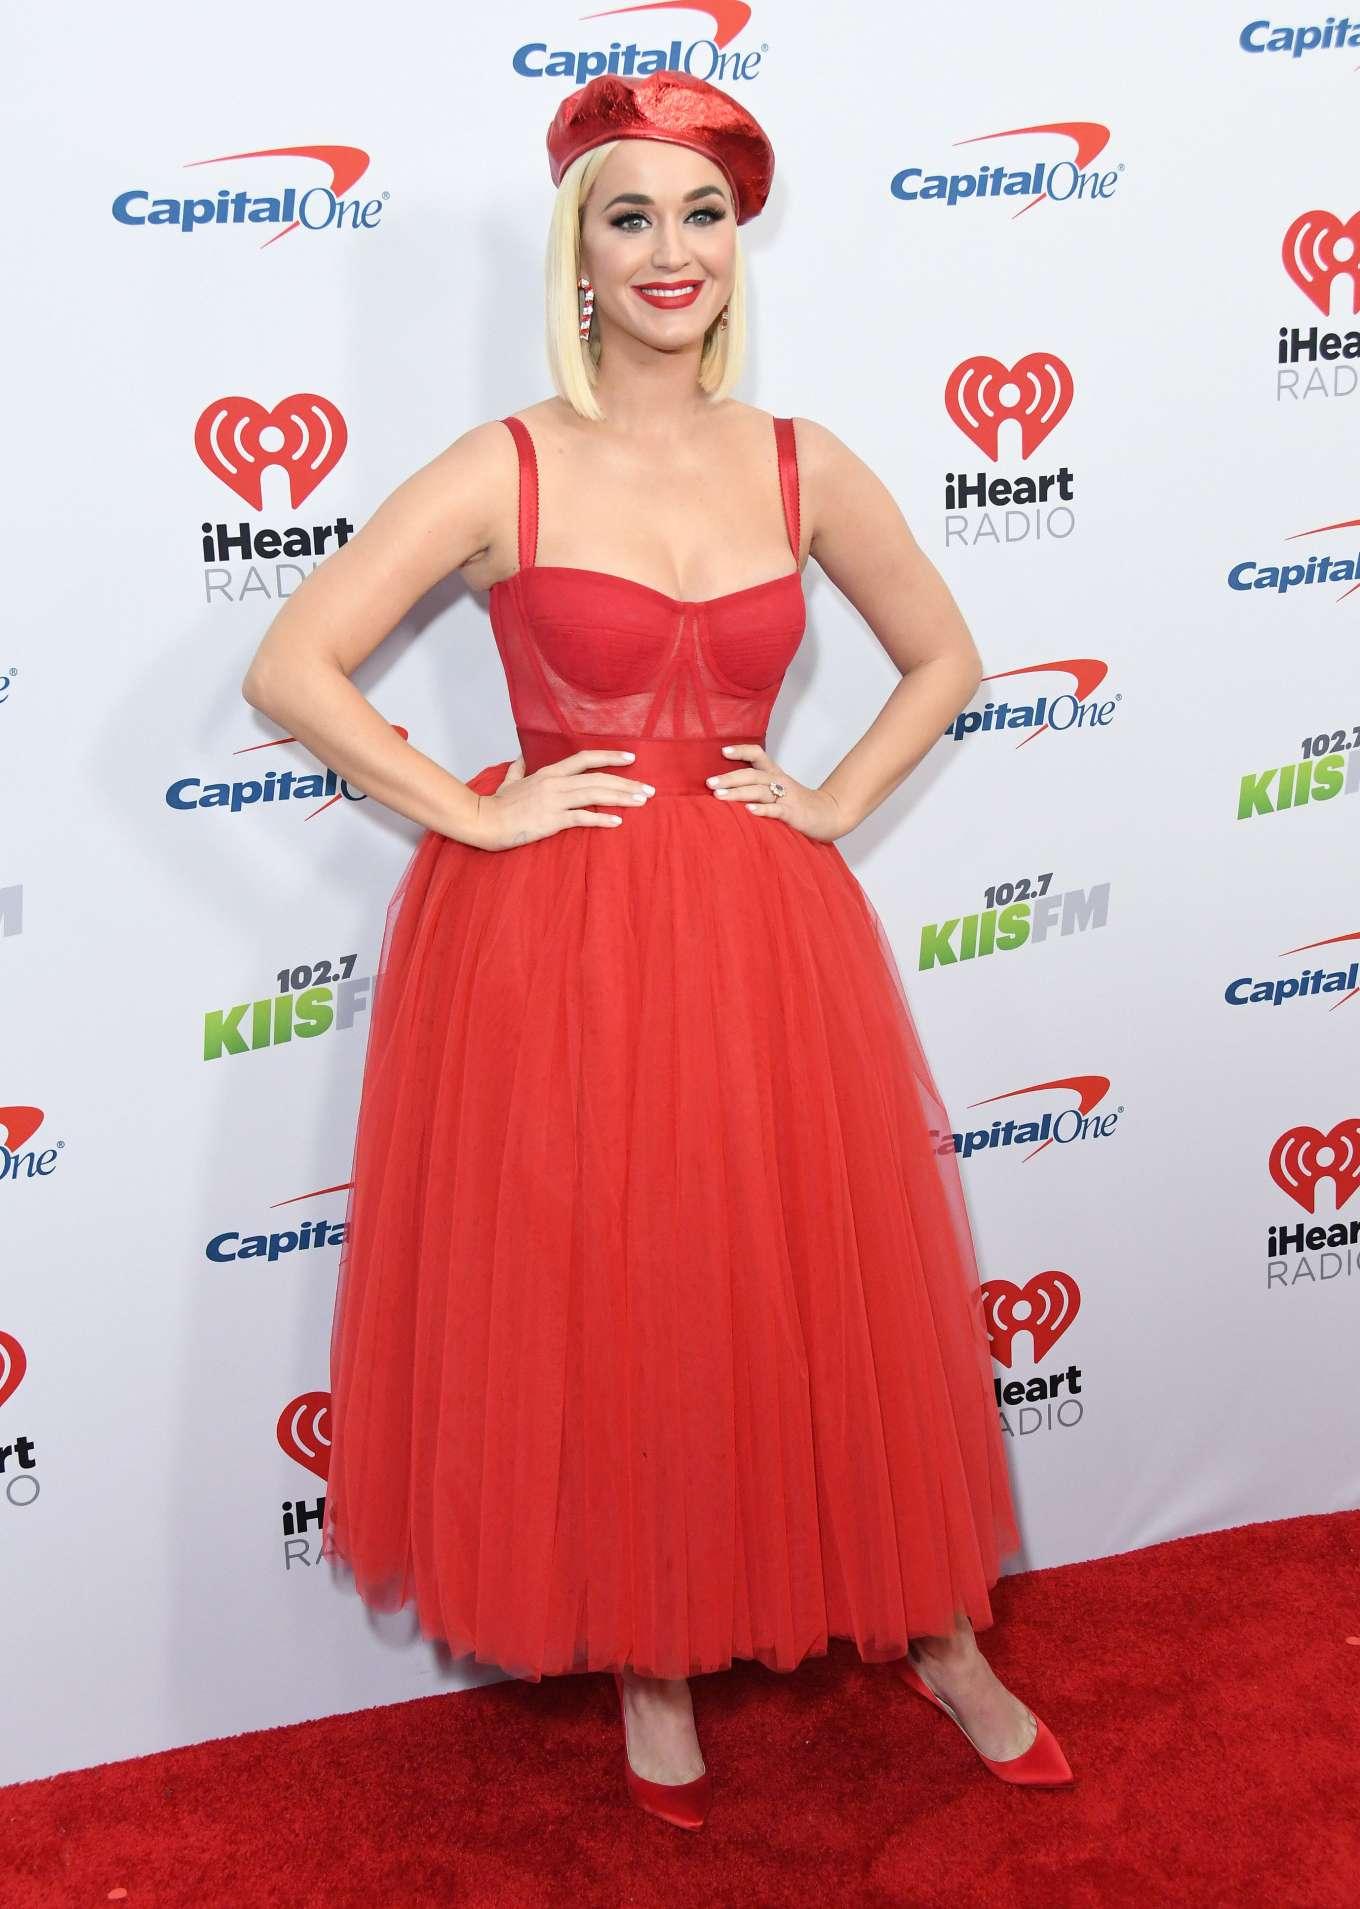 Katy Perry 2019 : Katy Perry – 2019 KIIS FMs iHeartRadio Jingle Ball-21